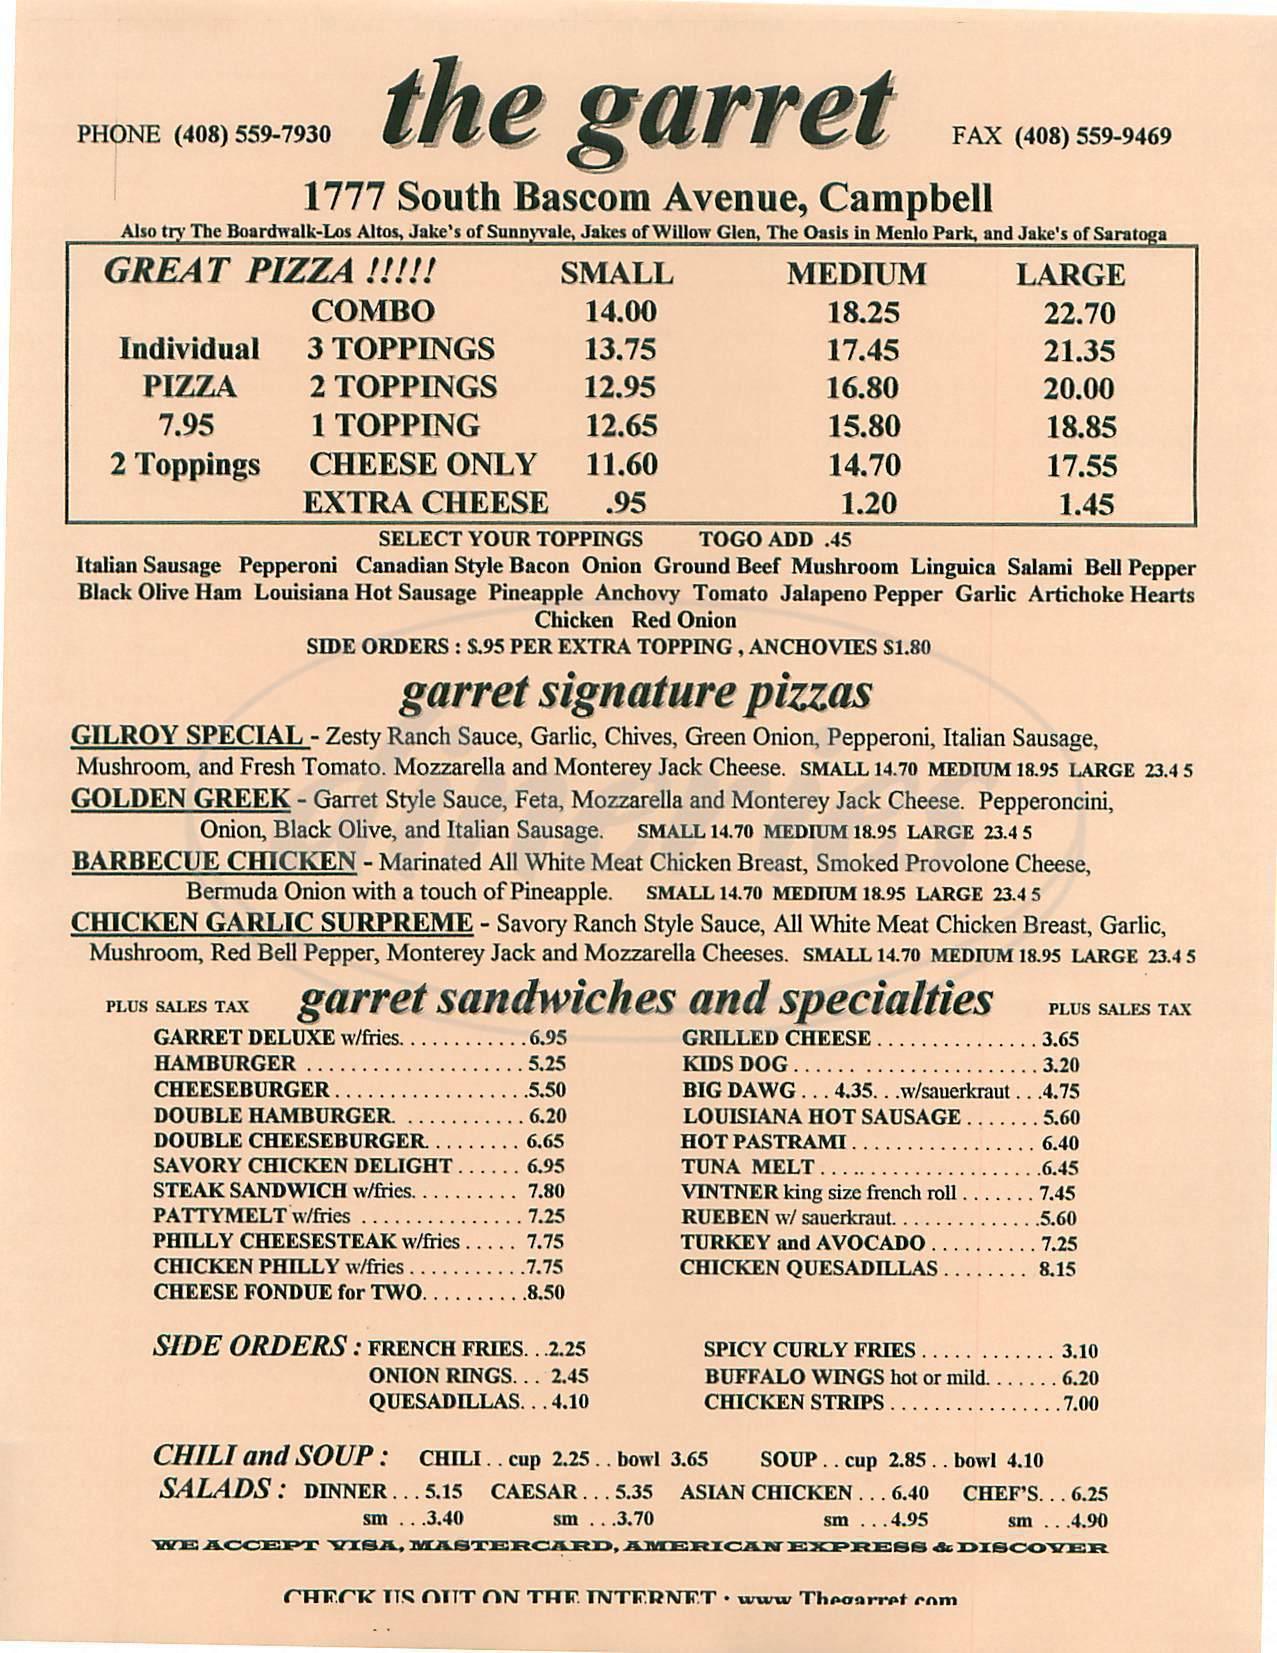 menu for The Garret